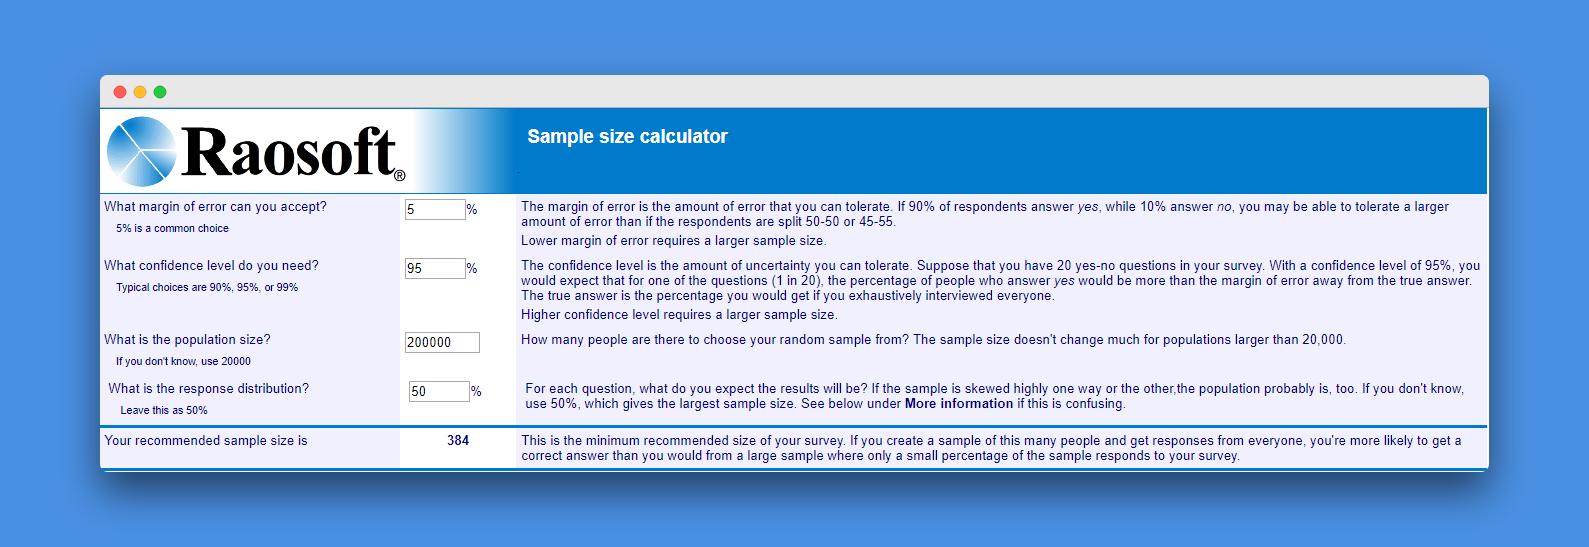 Sample size calculator by Raosoft